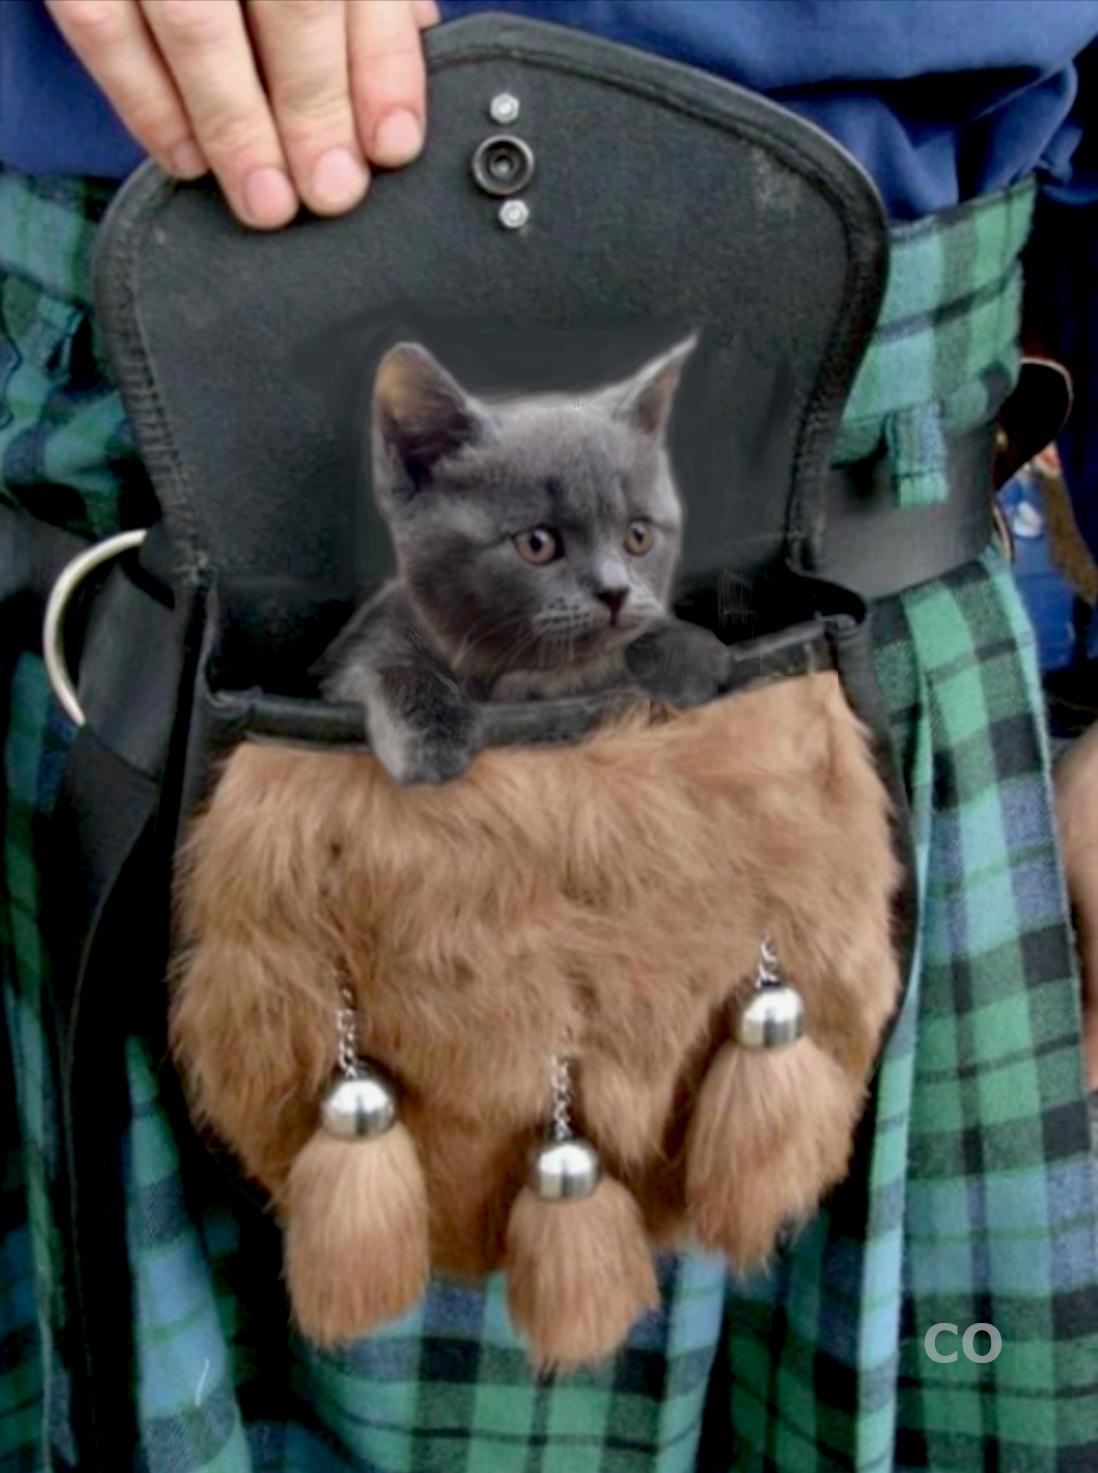 05 25 19 A Manipulated Photo Of Adso Bear In A Sporran By Co Outlander Novel Outlander Outlander Show